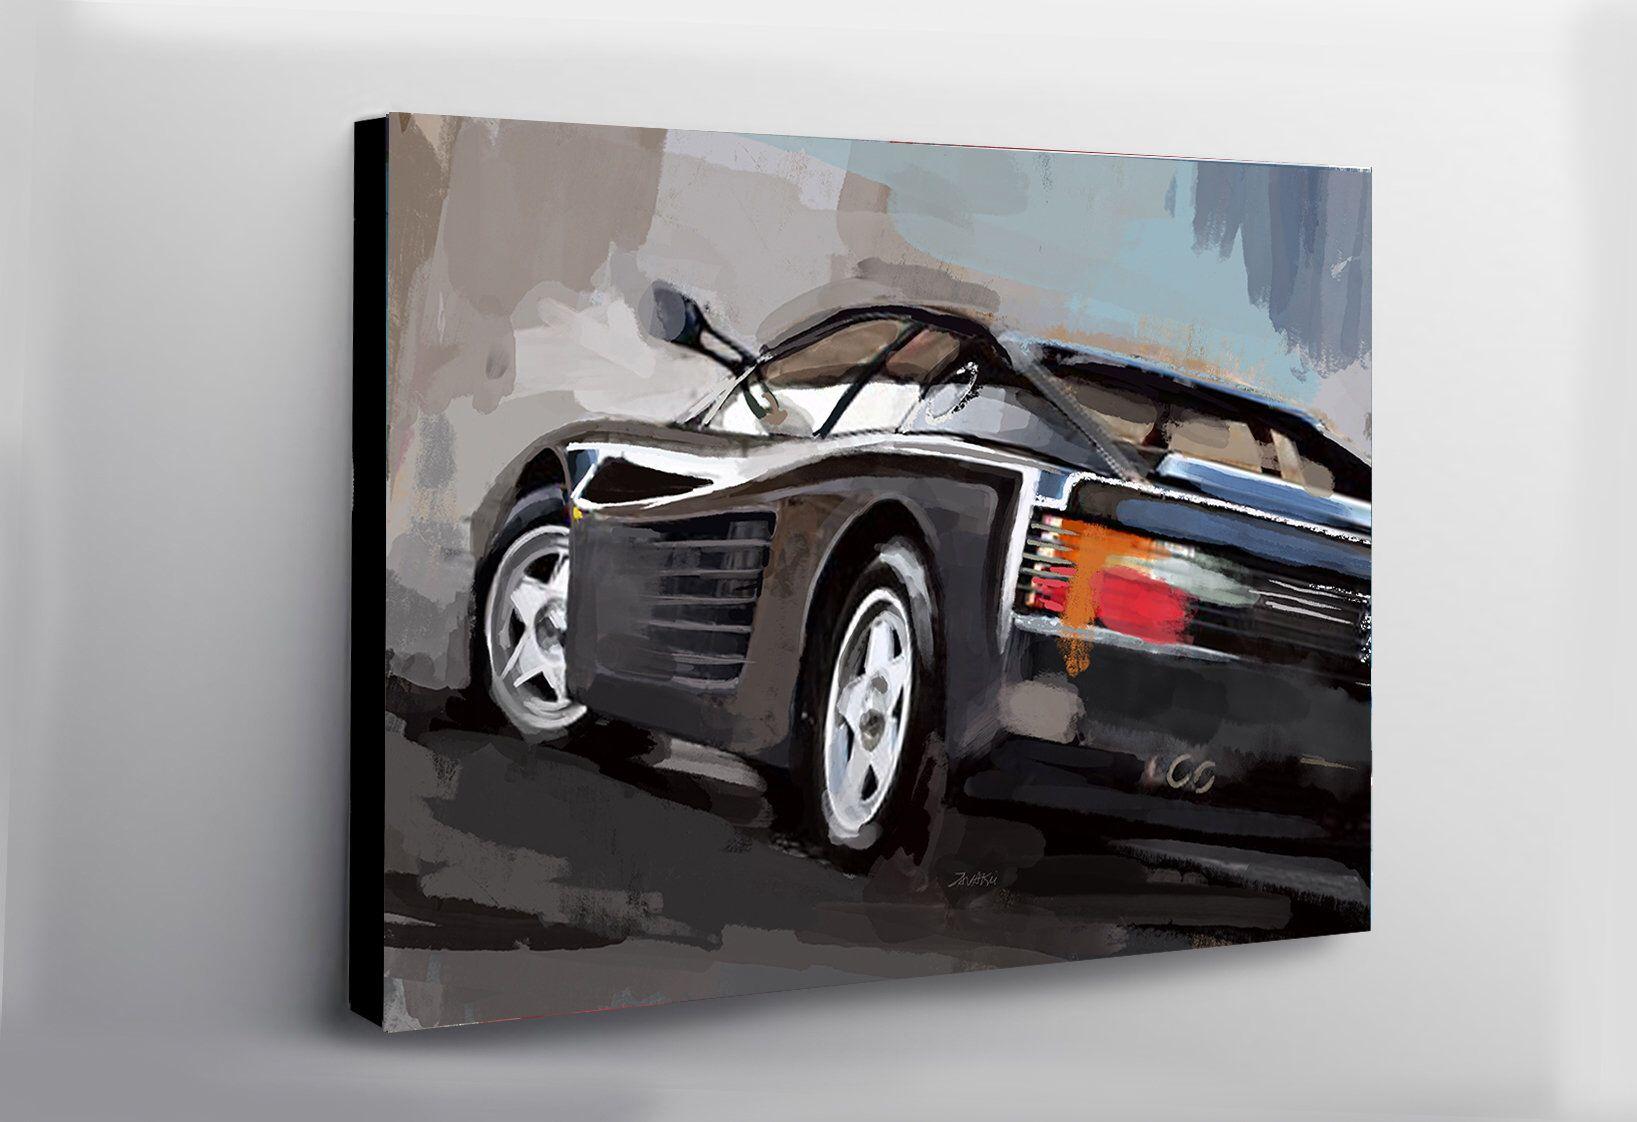 Ferrari Testarossa Black Painting Car Large Wall Decor Canvas Etsy In 2020 Automotive Art Car Painting